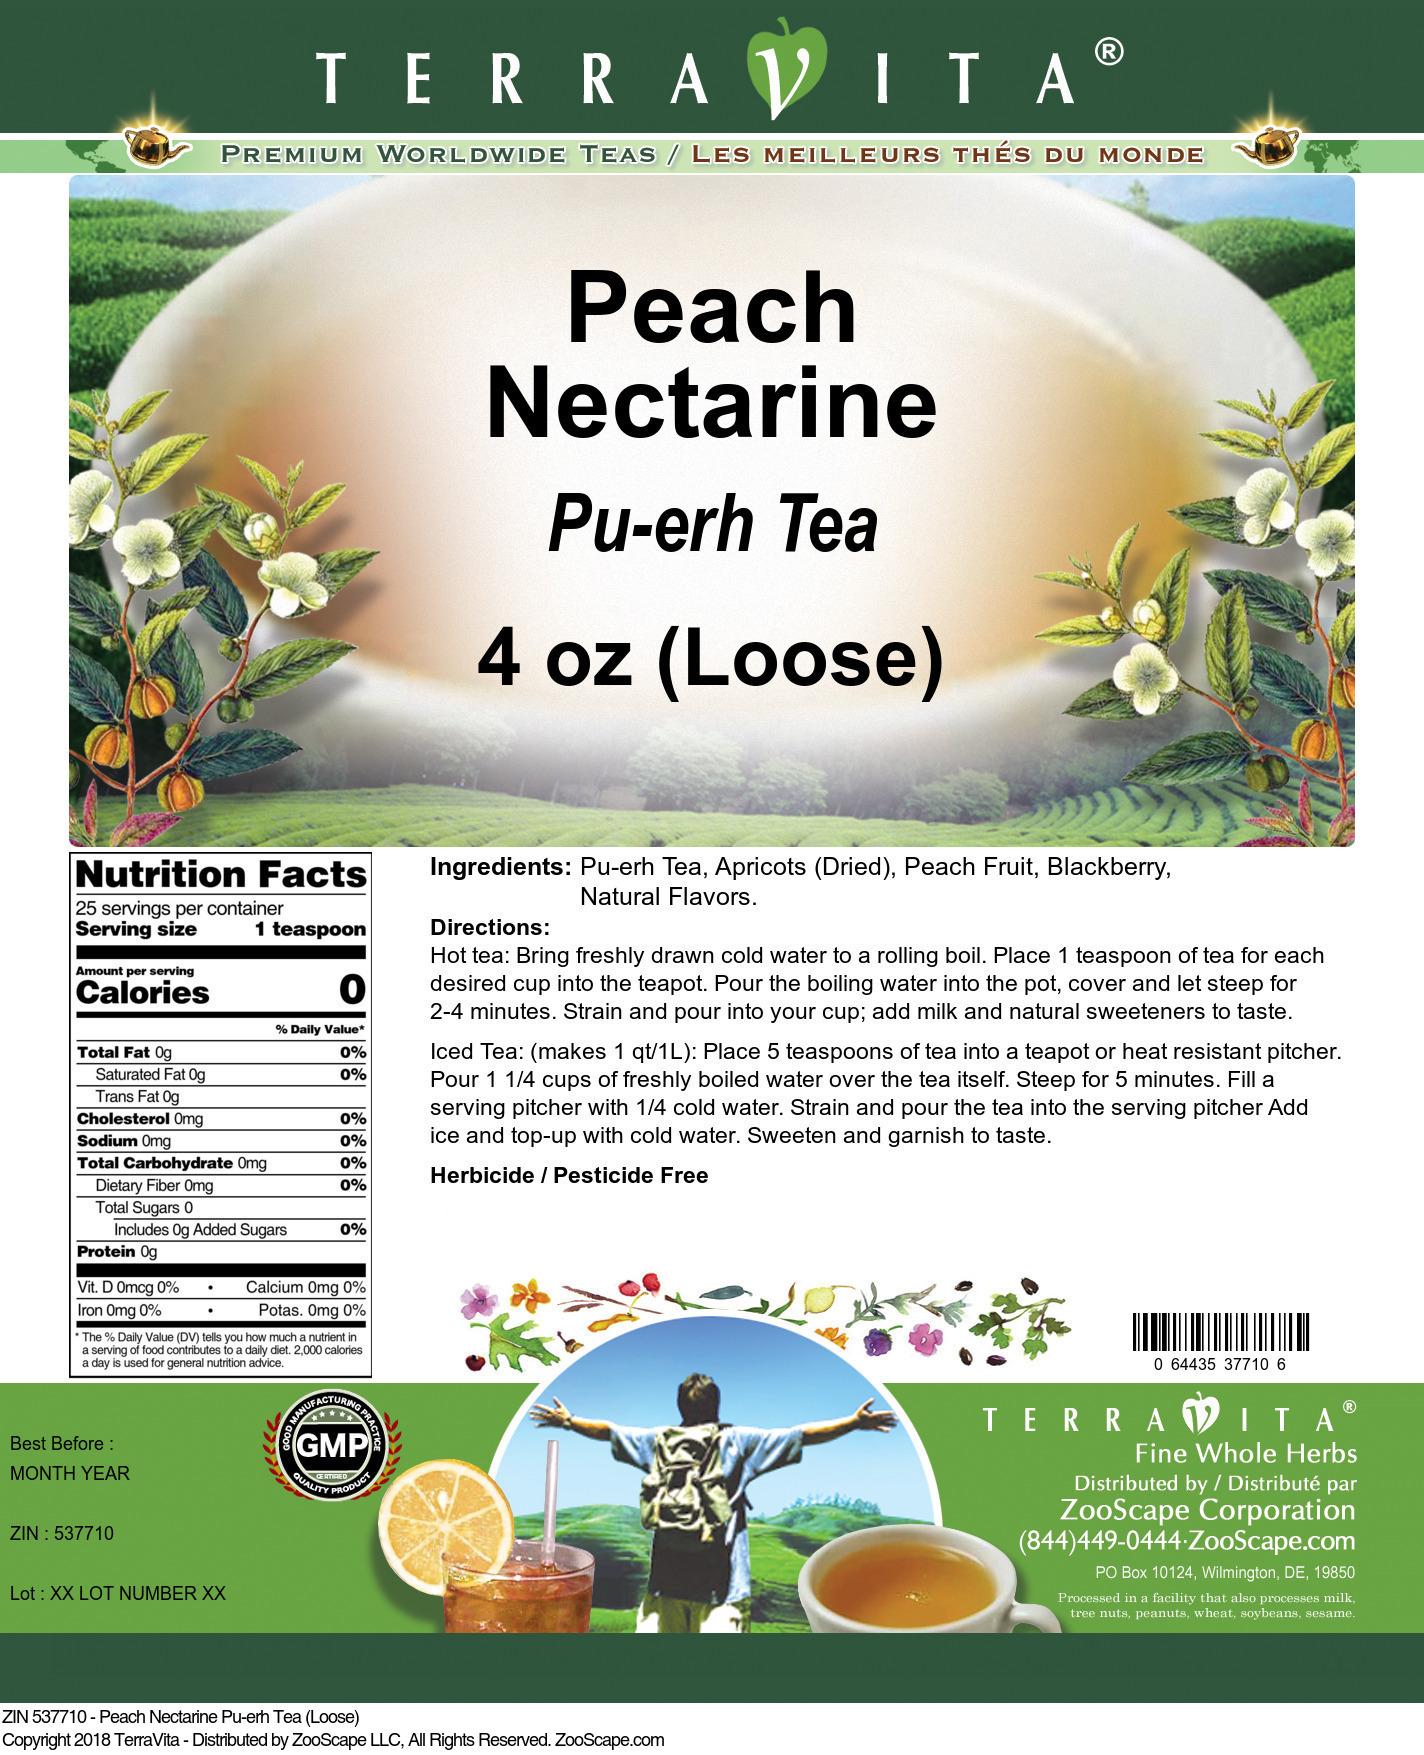 Peach Nectarine Pu-erh Tea (Loose)